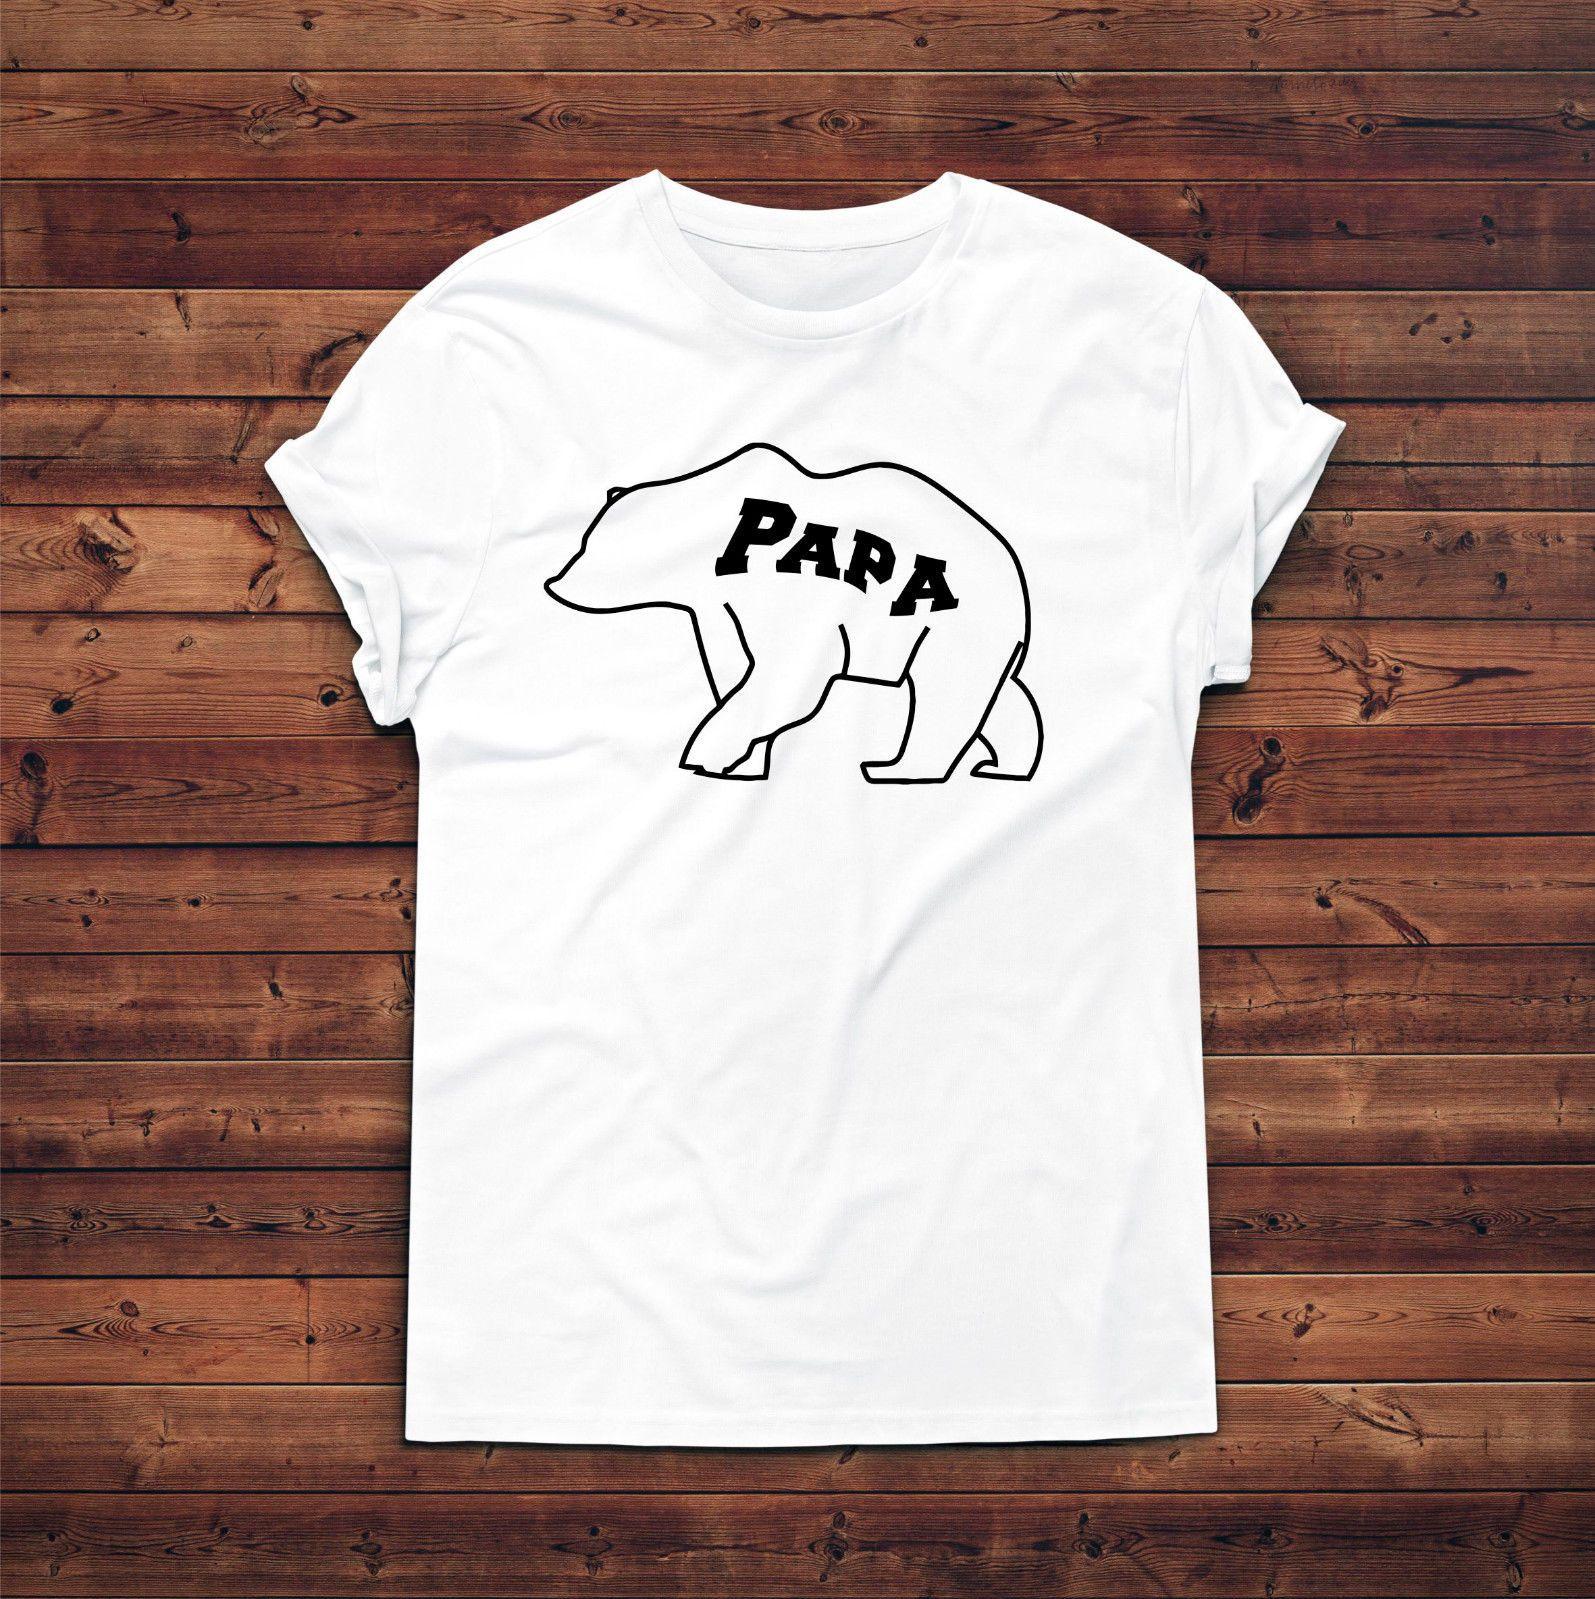 Papa Bear T ShirtGift For DadDaddy Birthday PresentNew Dad TshirtNew Daddy Funny Shirts Men Make From Shorttshirt 1572